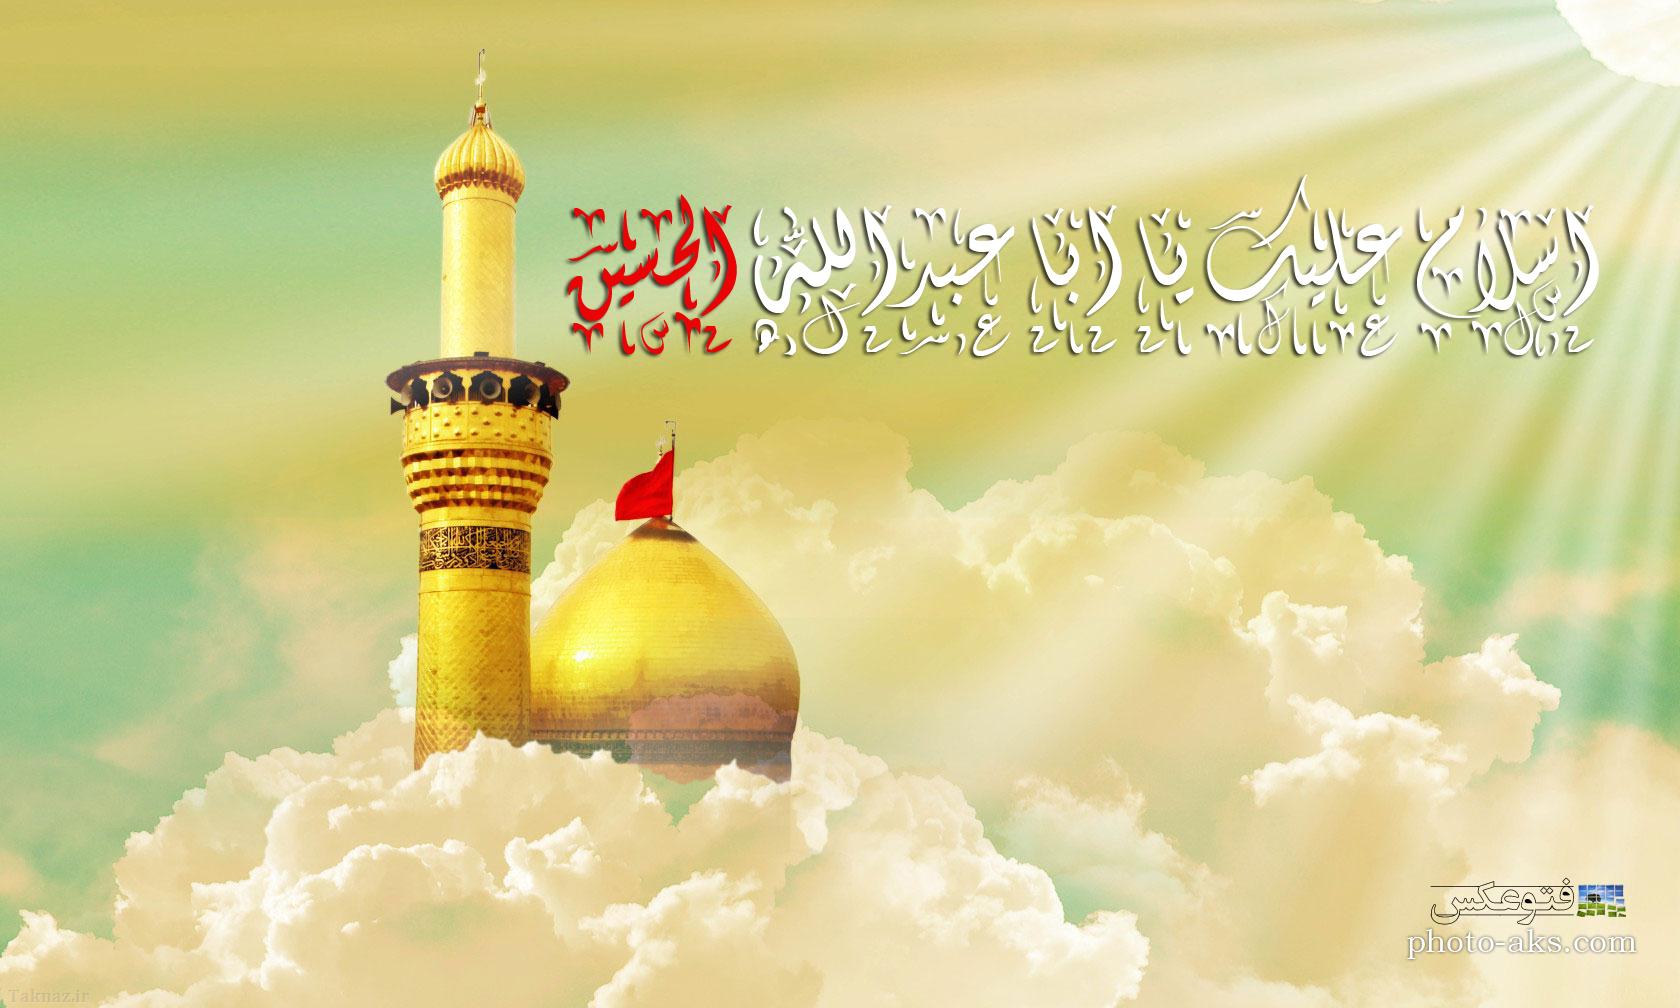 Wallpaper: Haram of Imam Hossain and the Sky